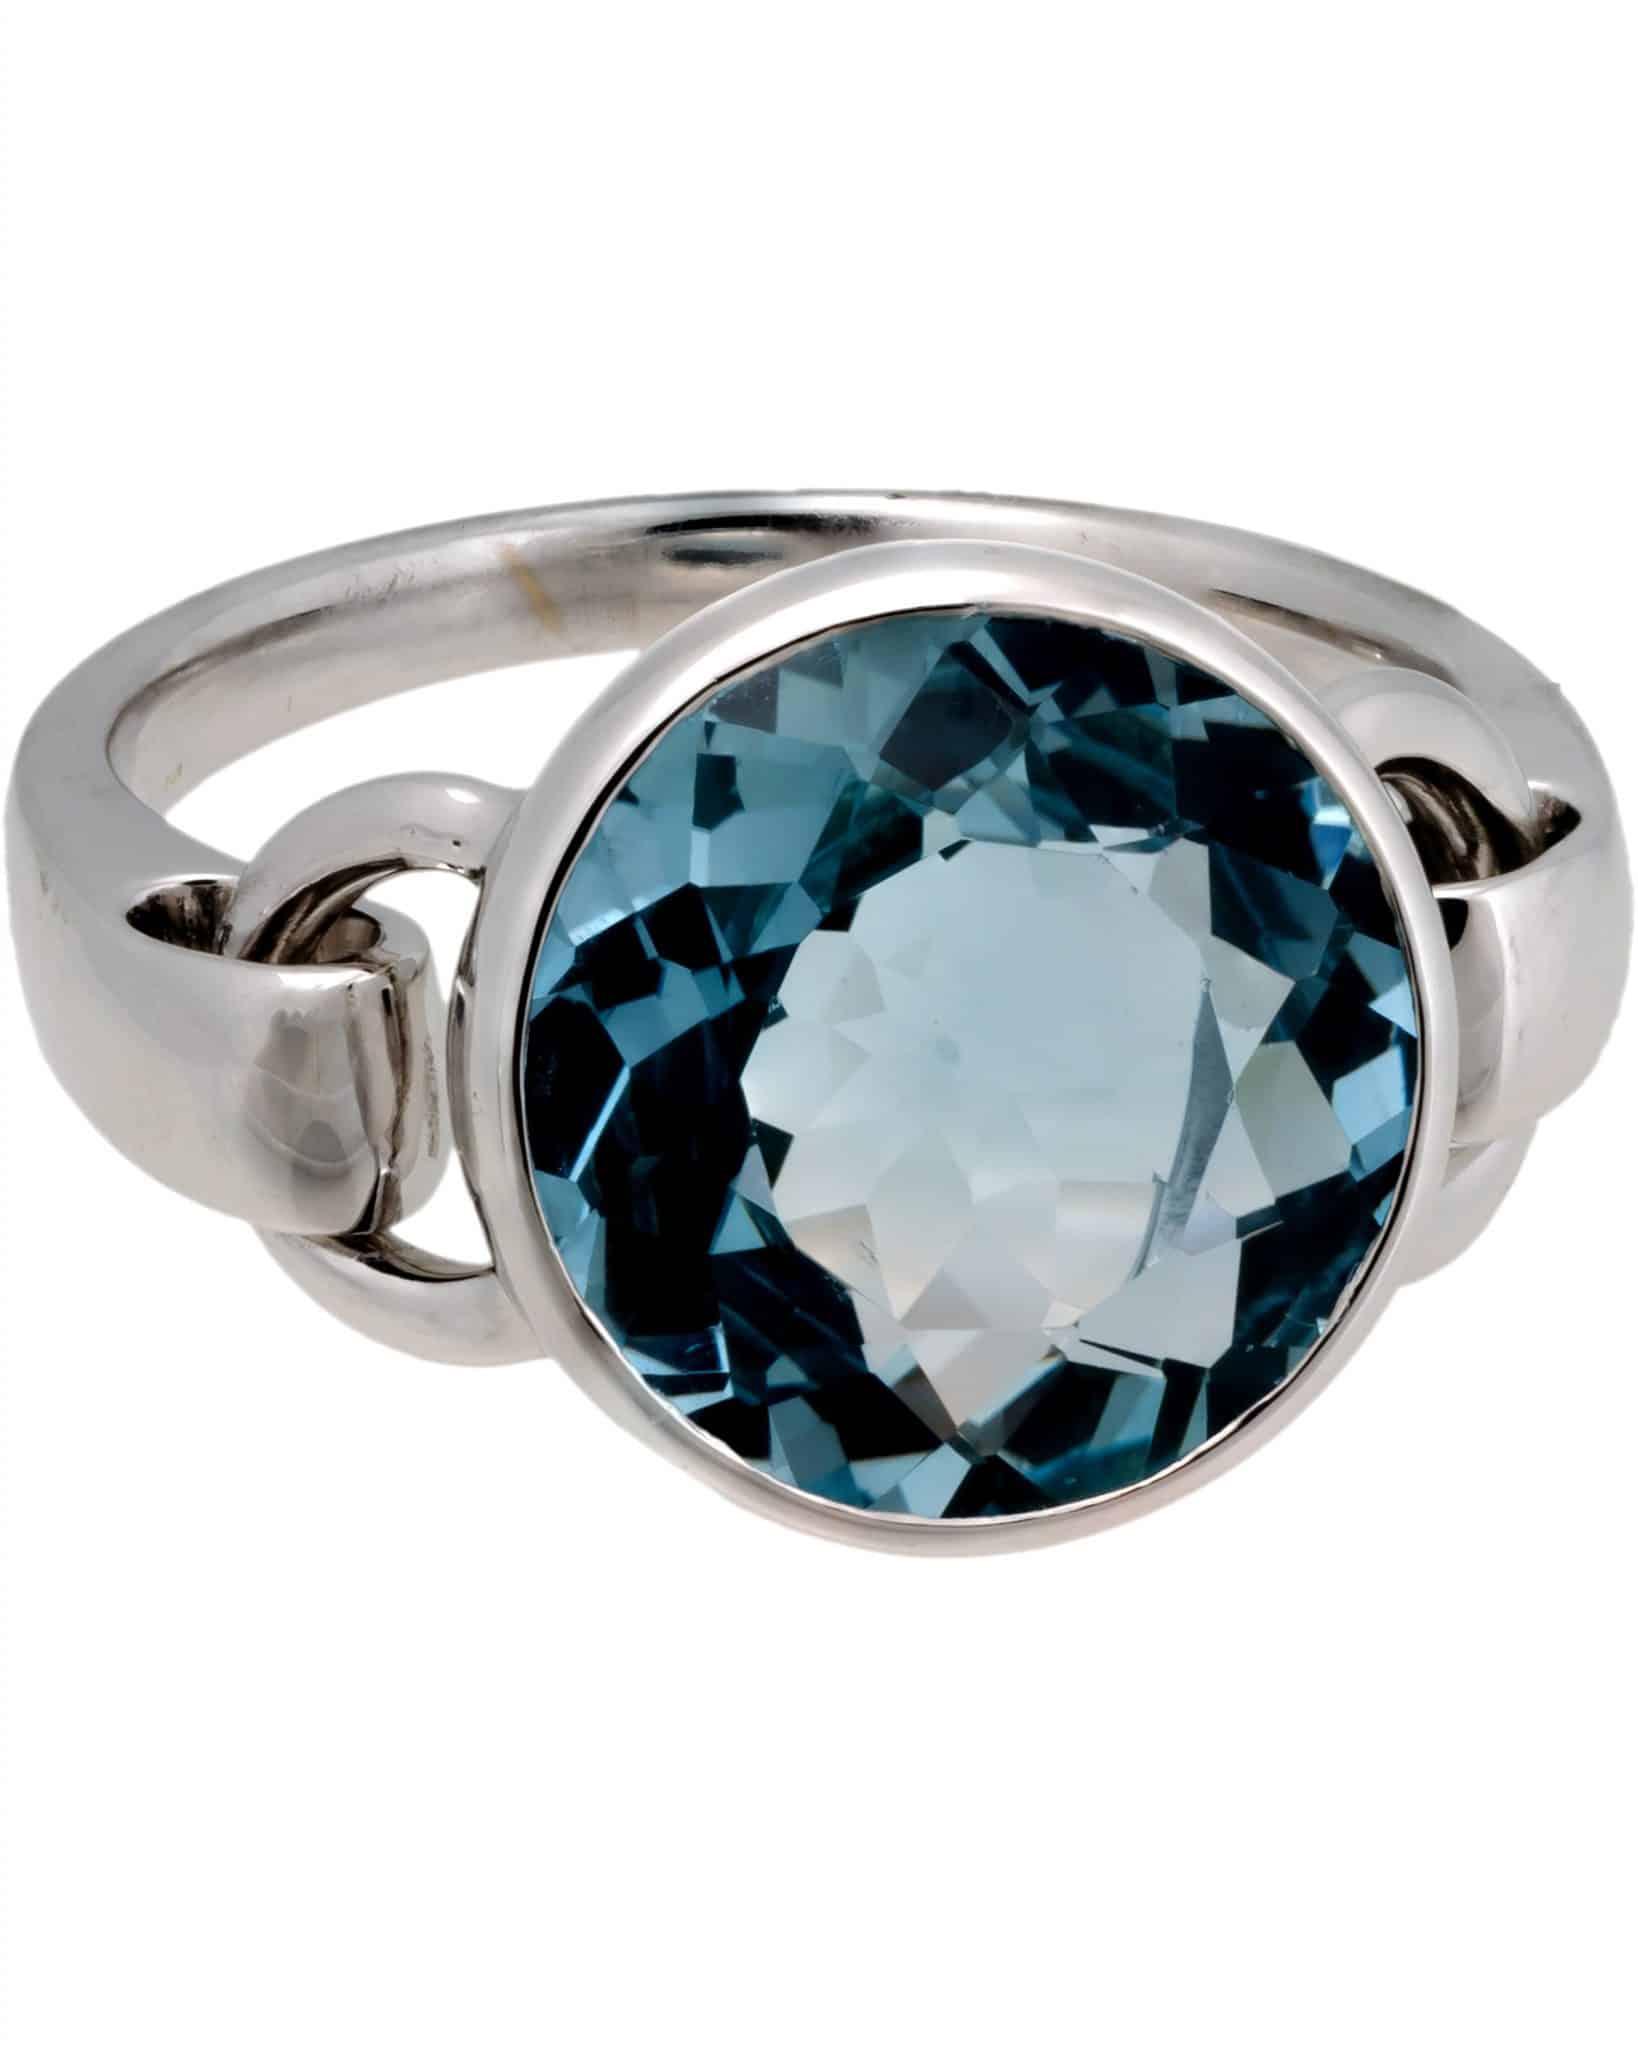 POIRAY - Indrani White Gold Blue Topaz Ring - Size 6.75